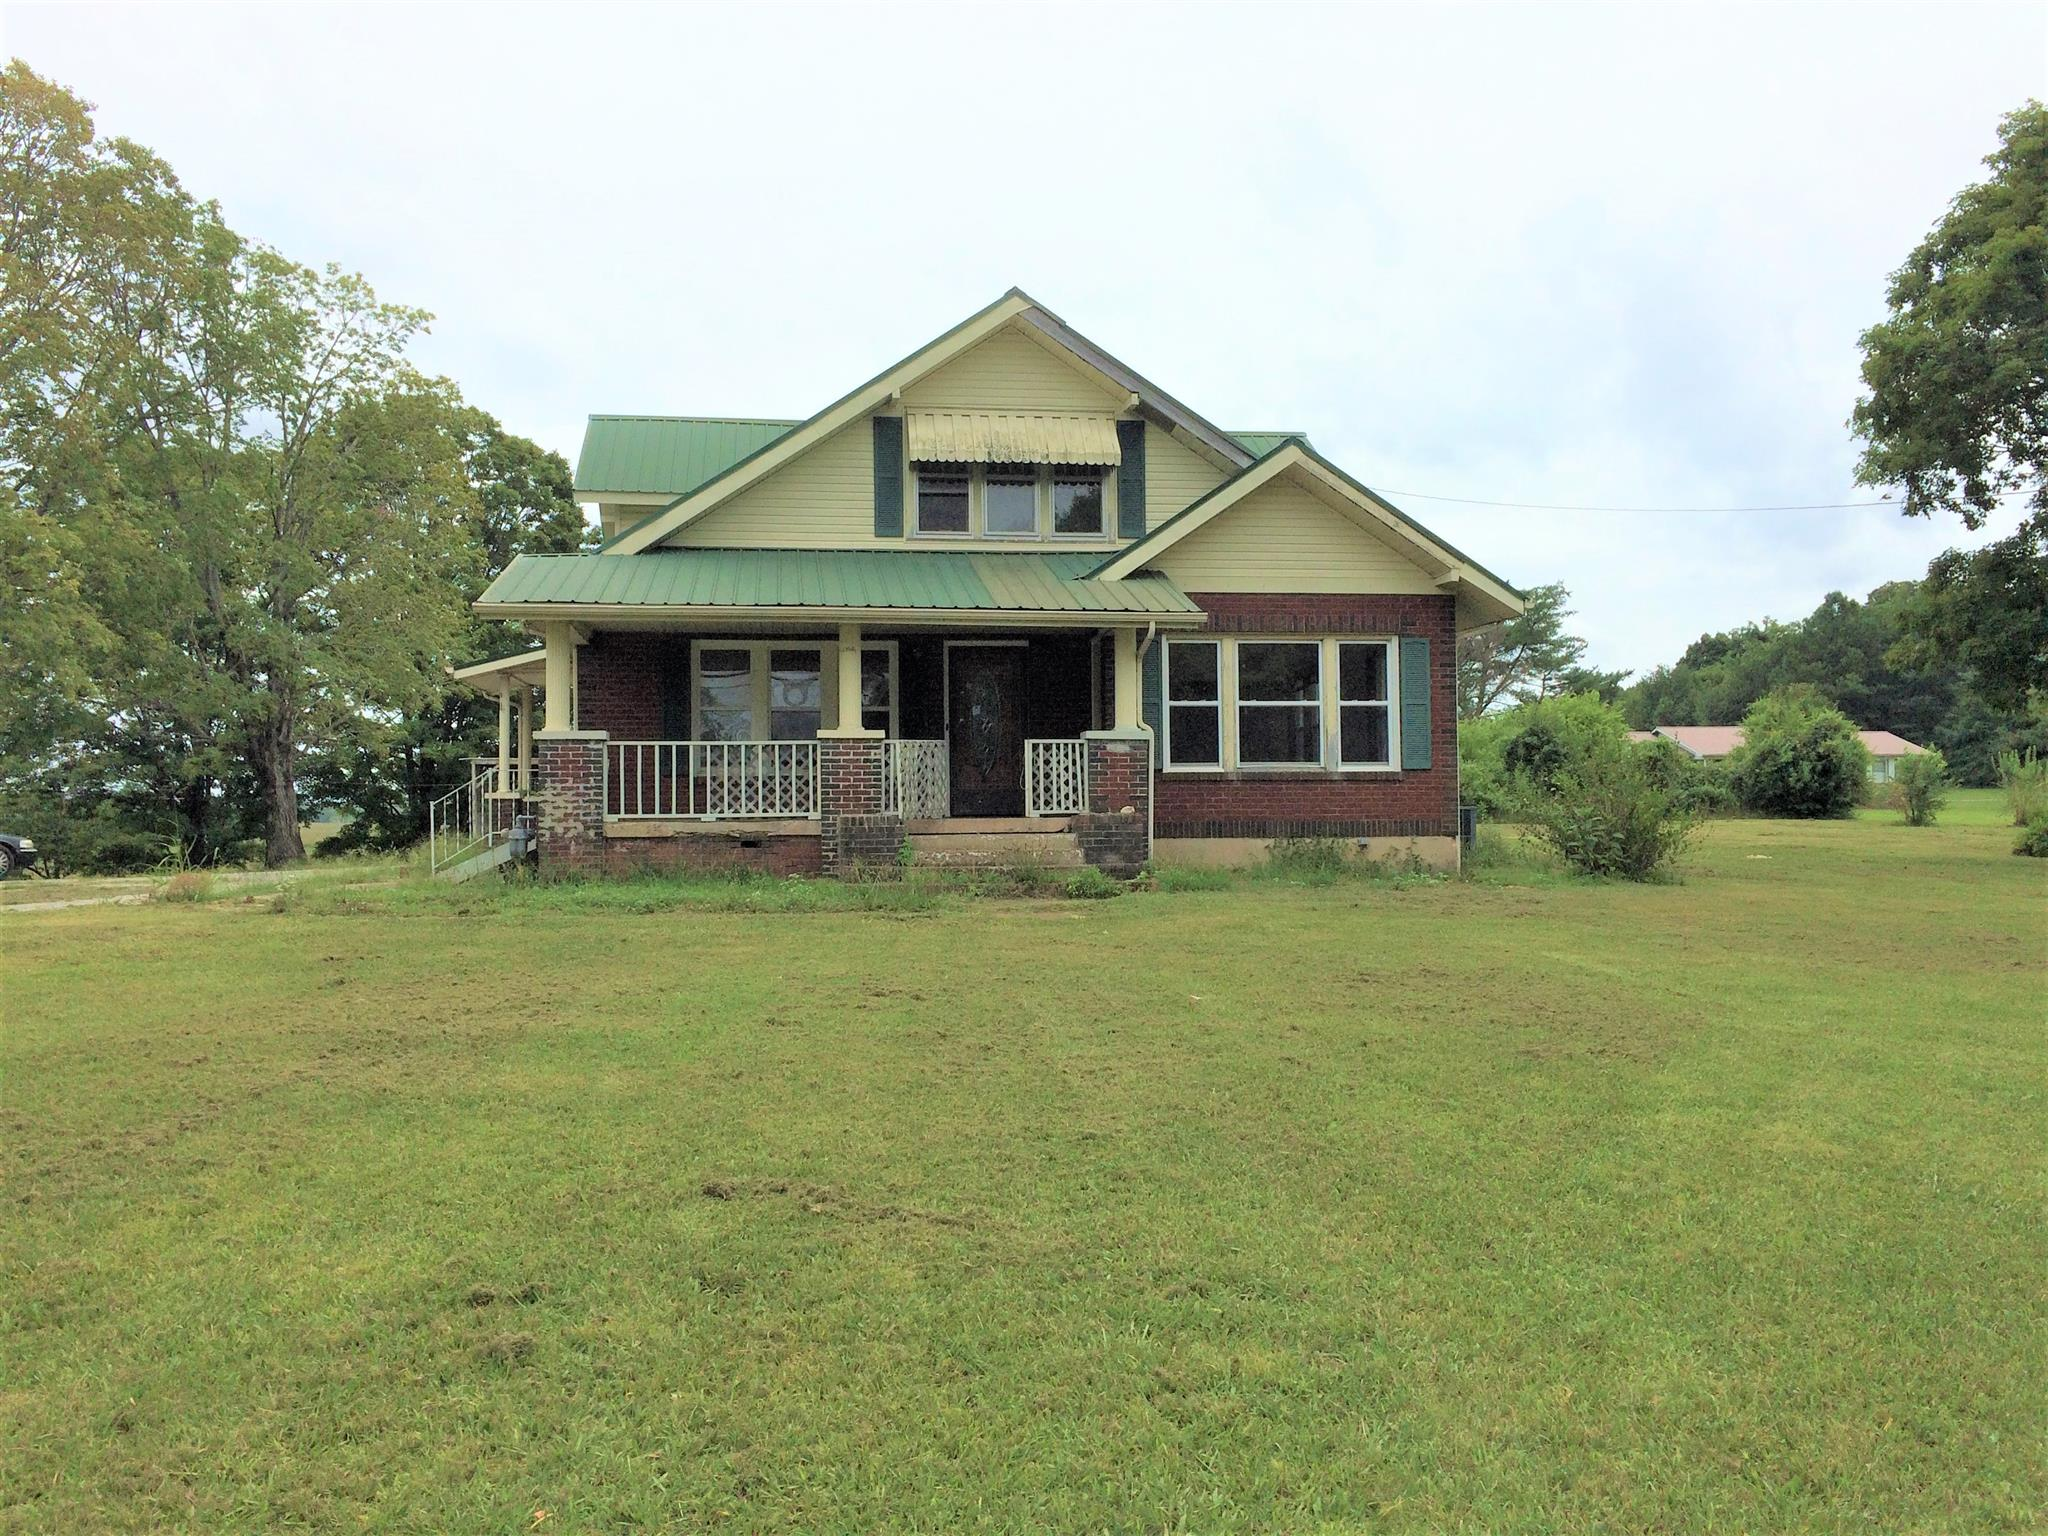 1205 David Crockett Hwy, Winchester, TN 37398 - Winchester, TN real estate listing